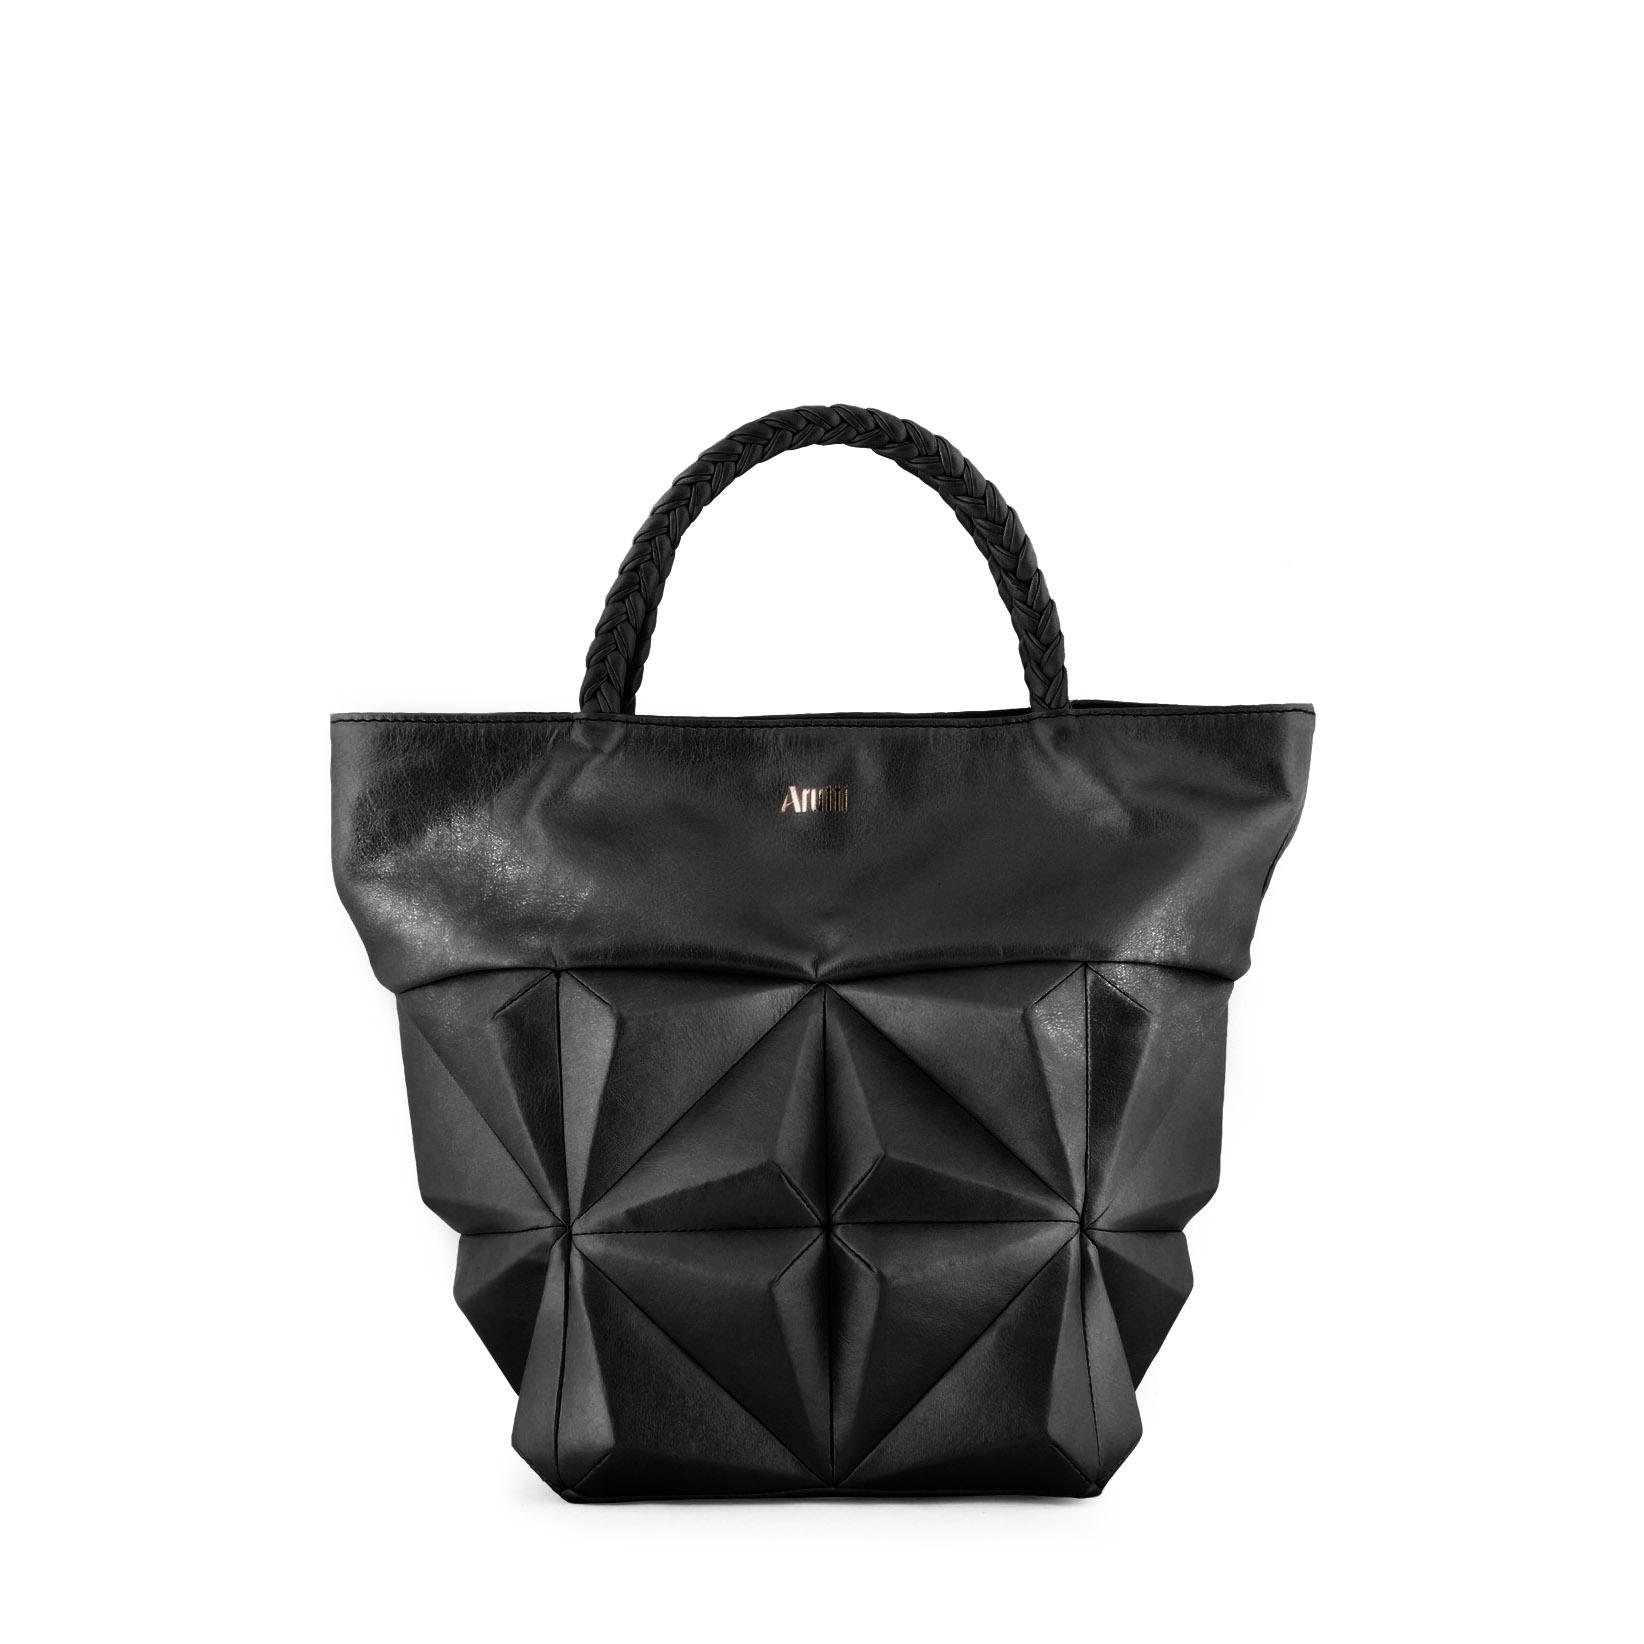 arutti_london_glamour_black_beauty